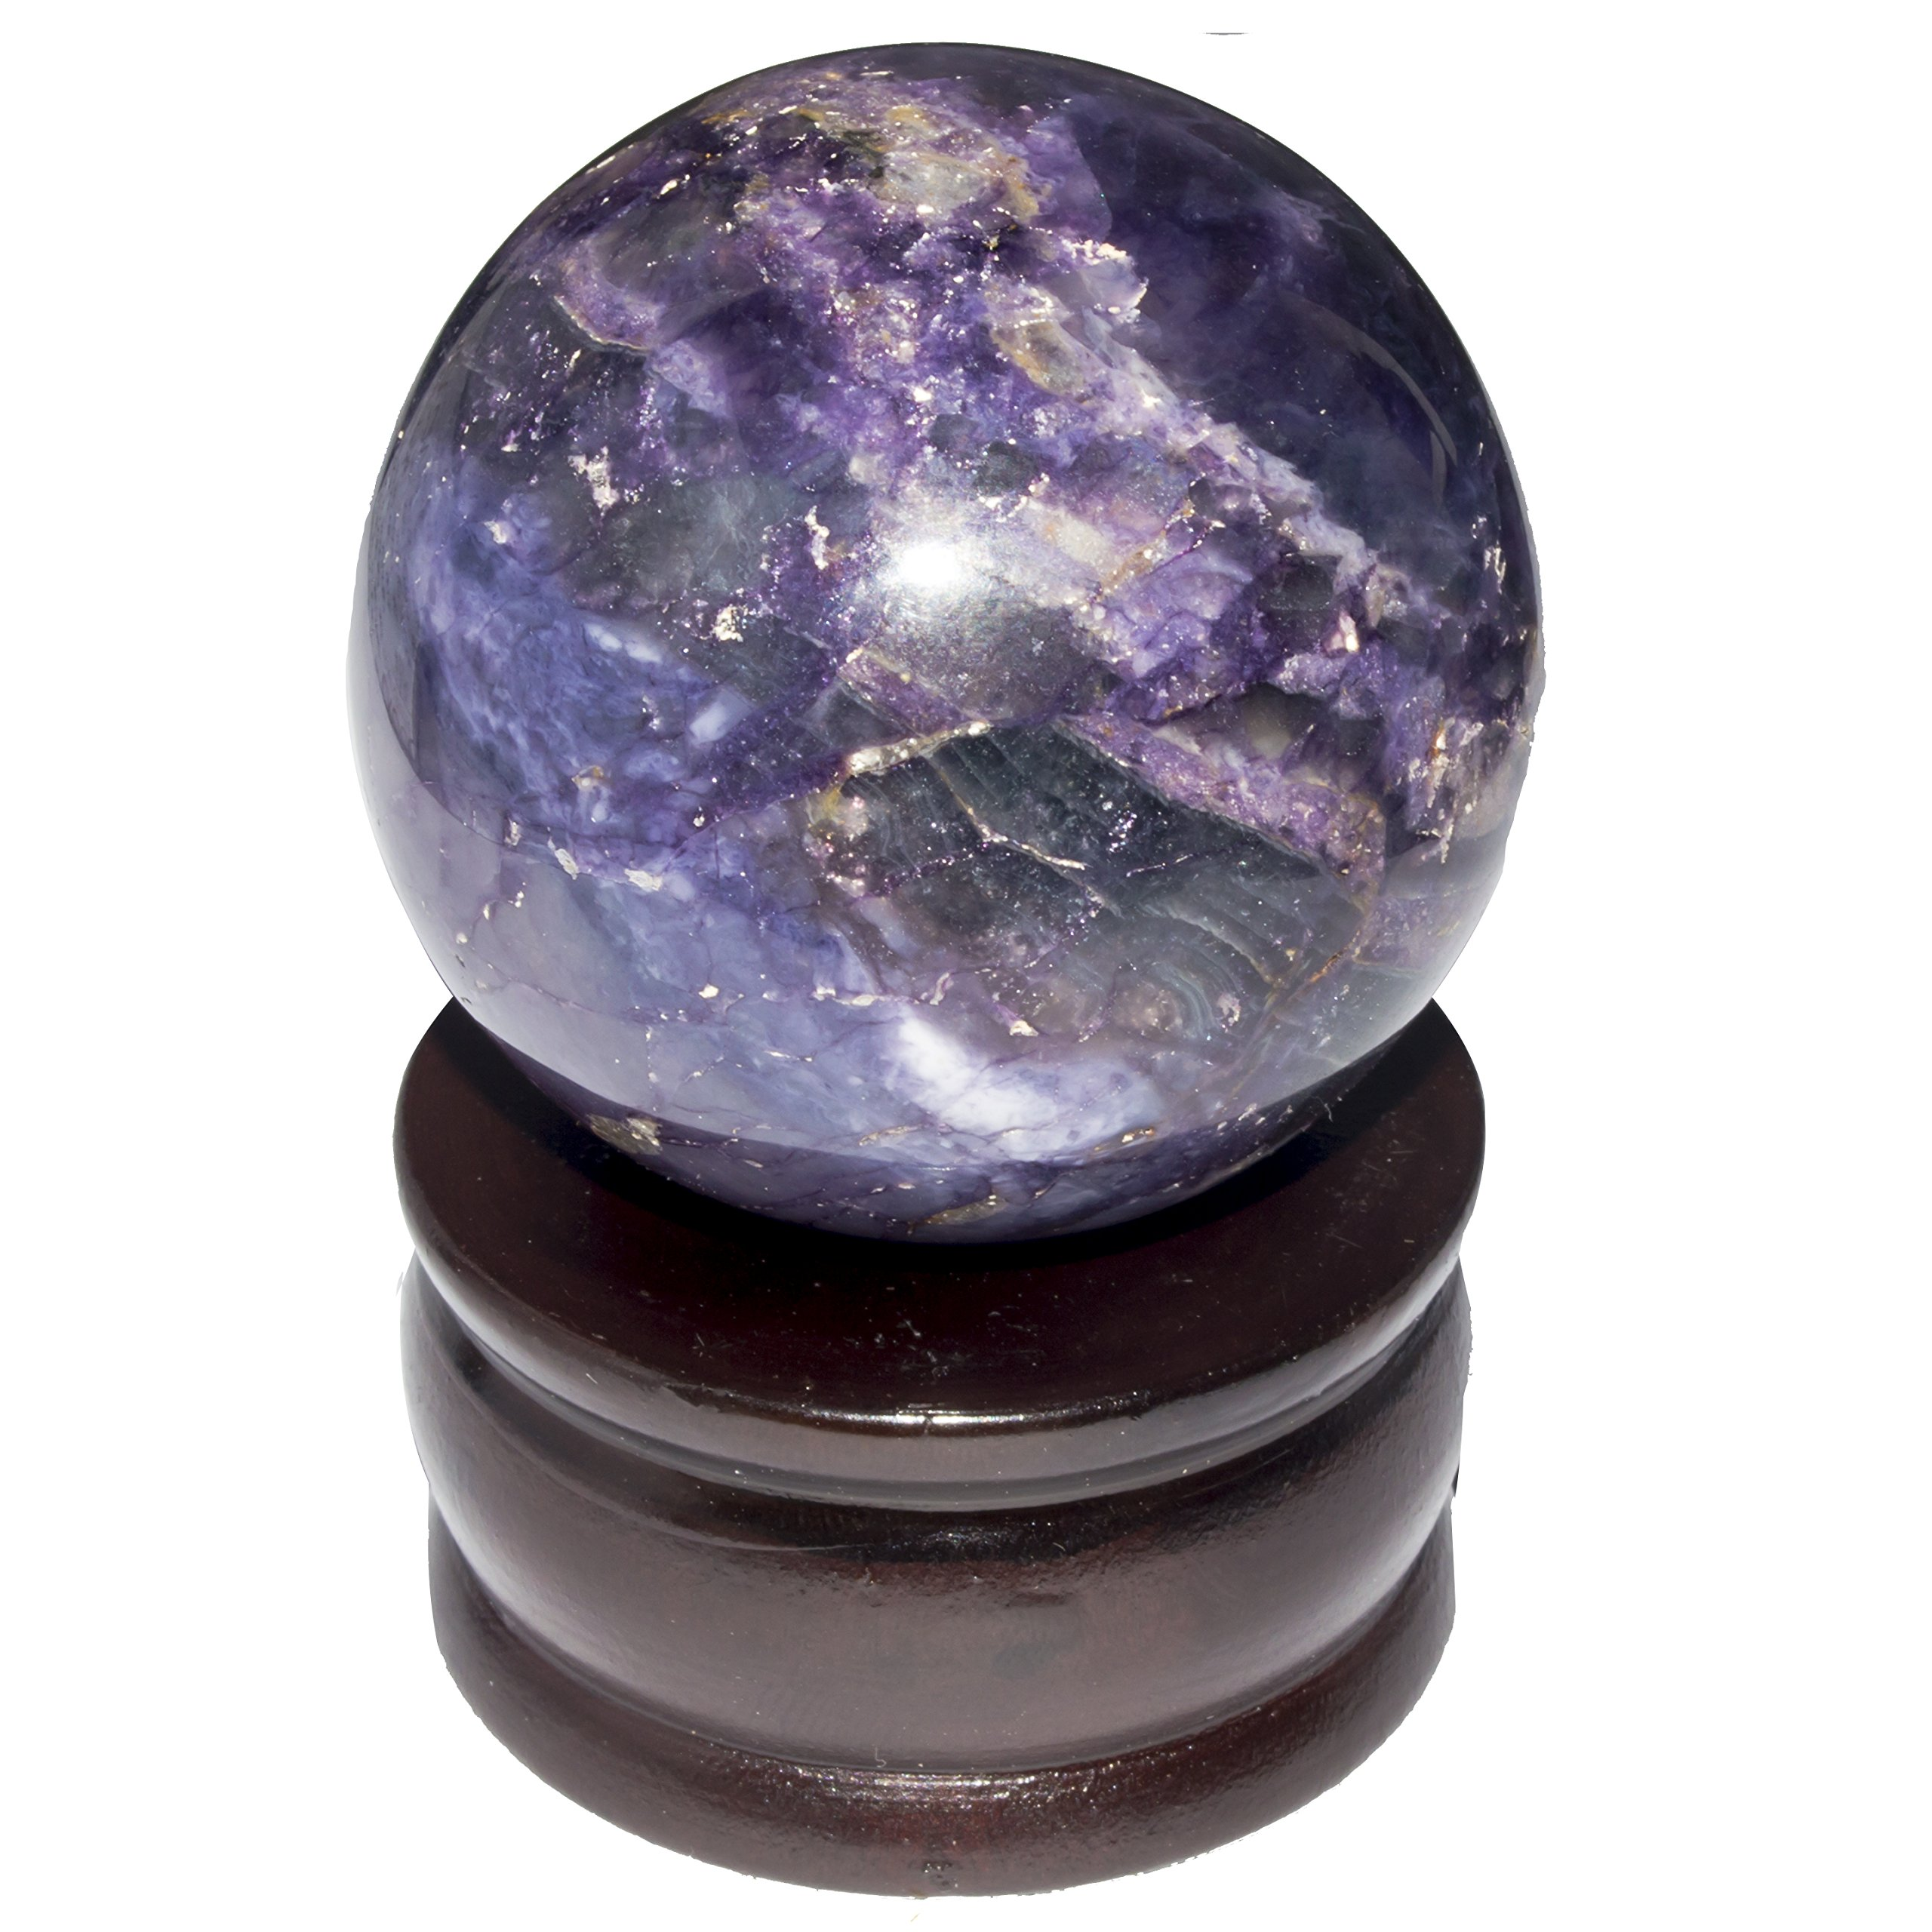 Crocon Iolite Reiki Healing Sphere Ball Gemstone Energy Generator For Aura Cleansing Chakra Balancing & EMF Protection 50-60mm